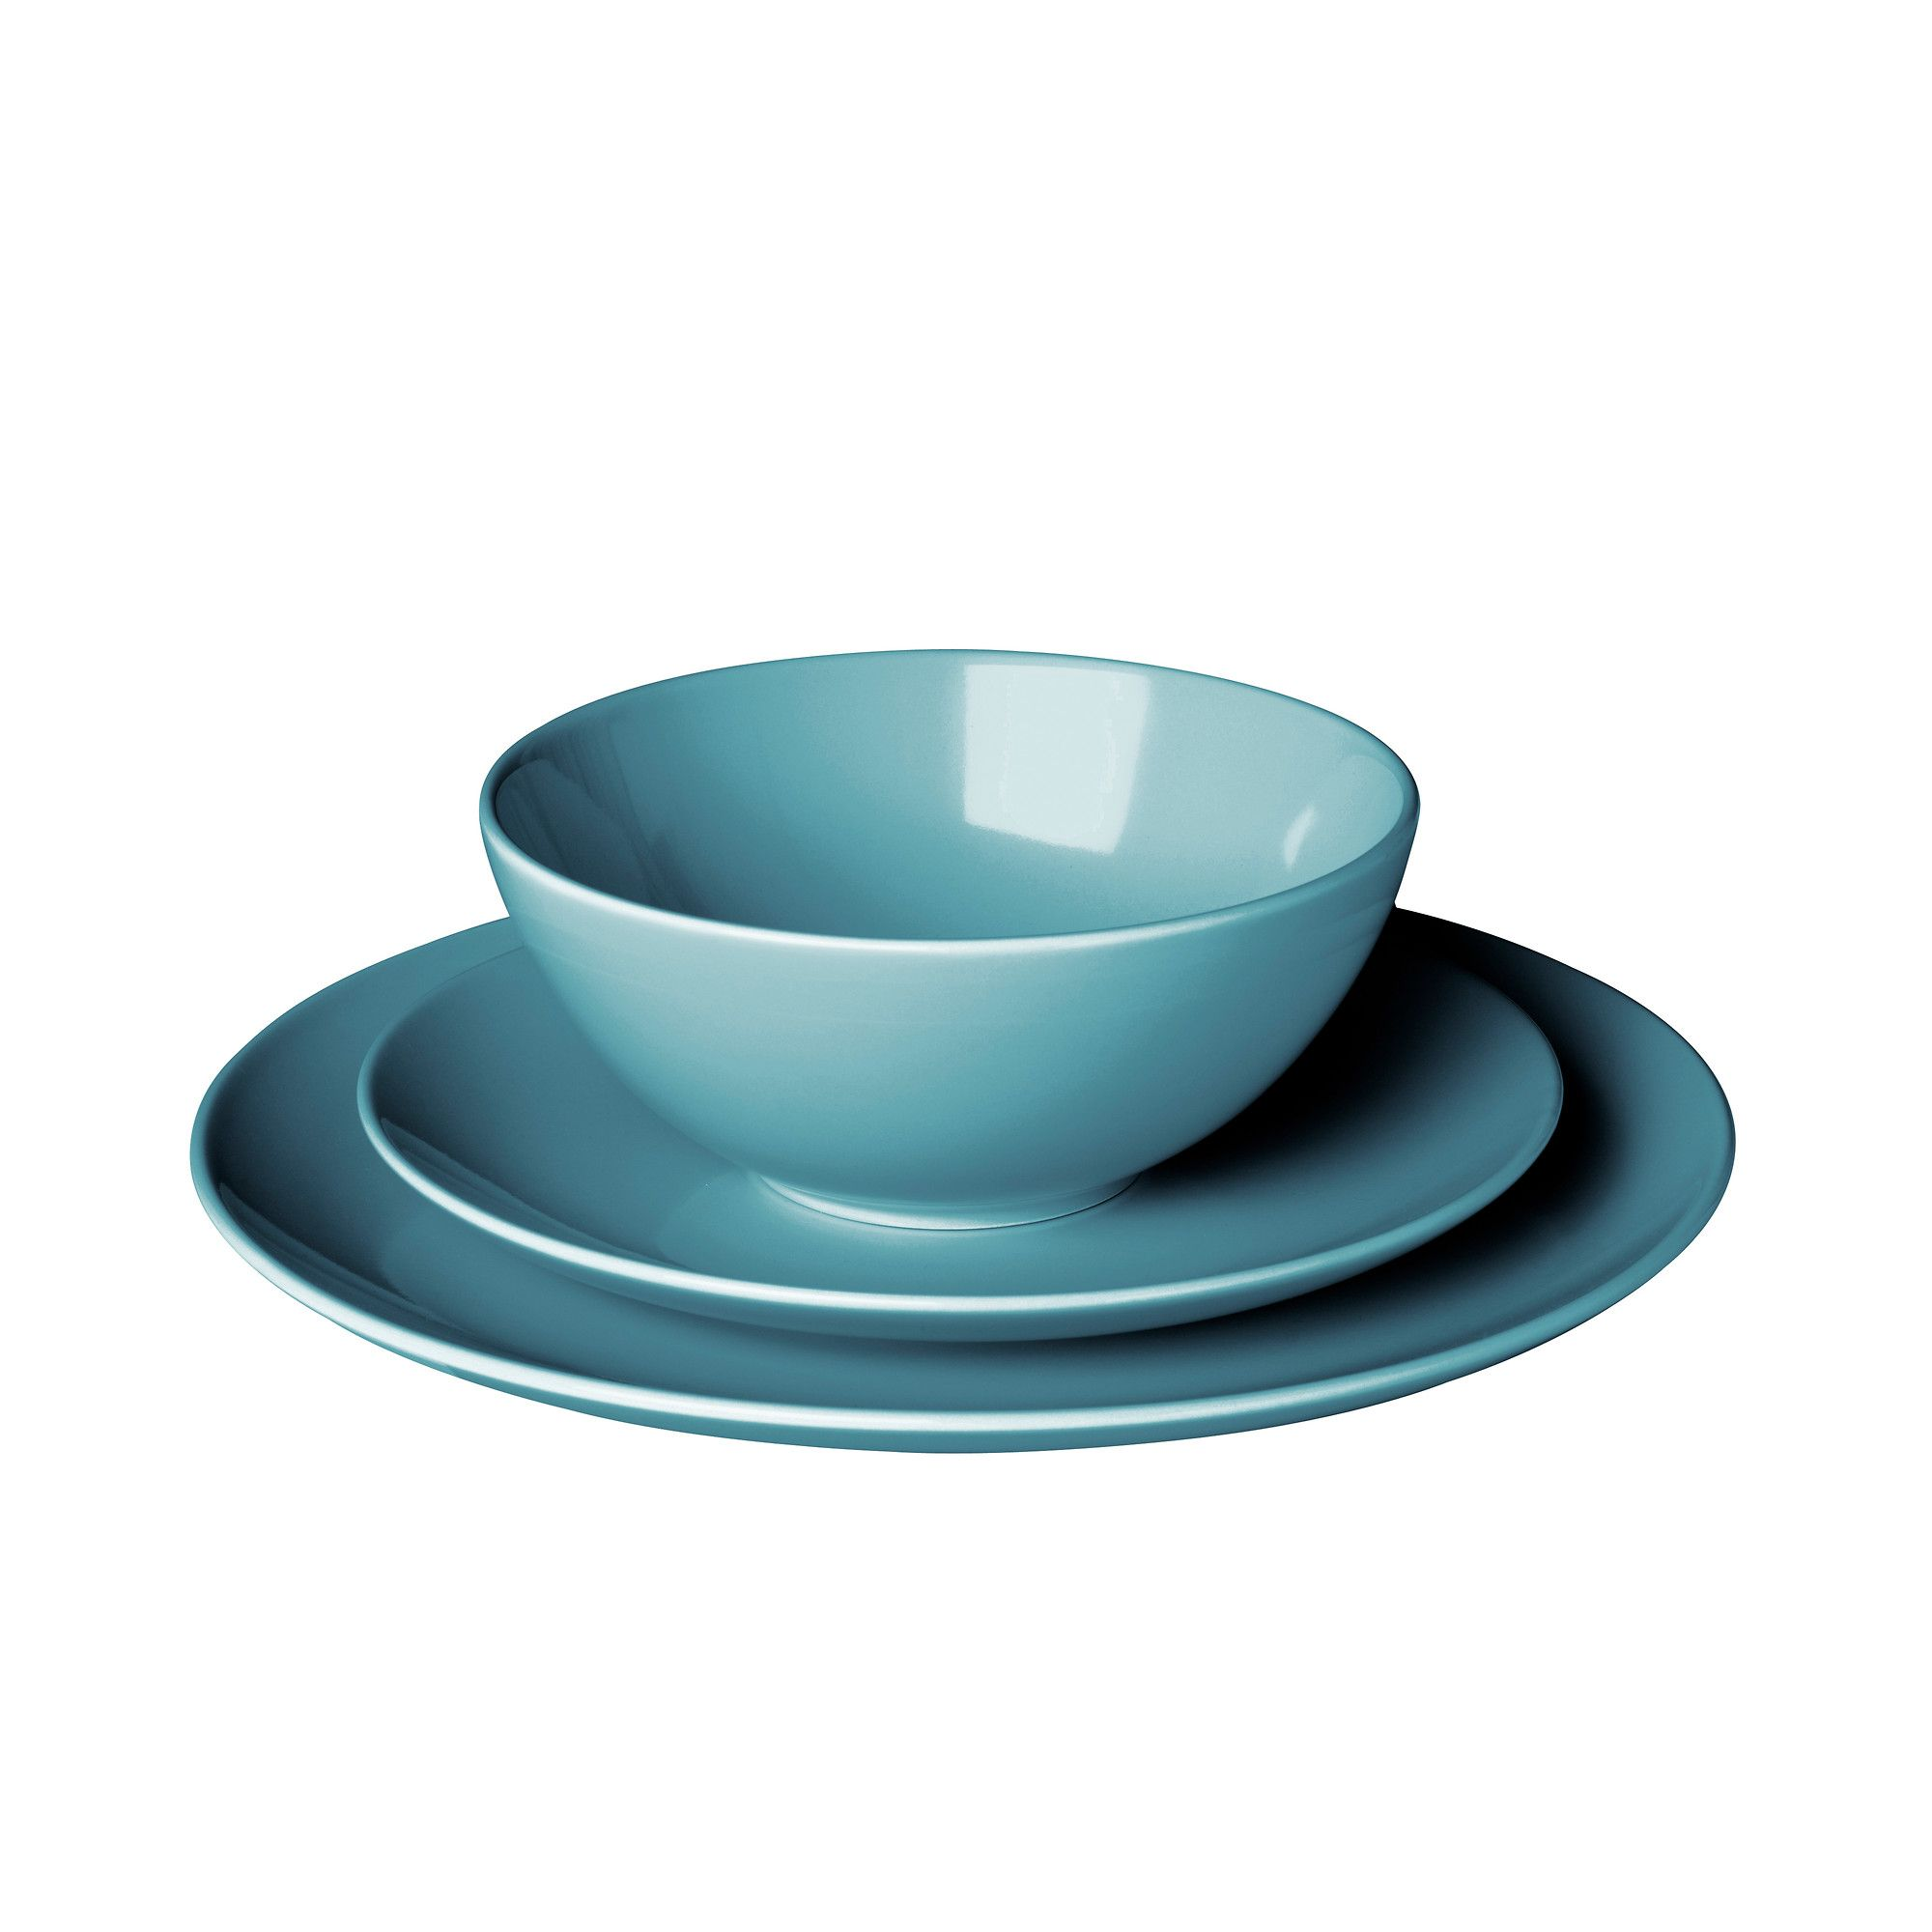 FÄRGRIK 18-piece dinnerware set, turquoise | Dinnerware, Kitchens ...